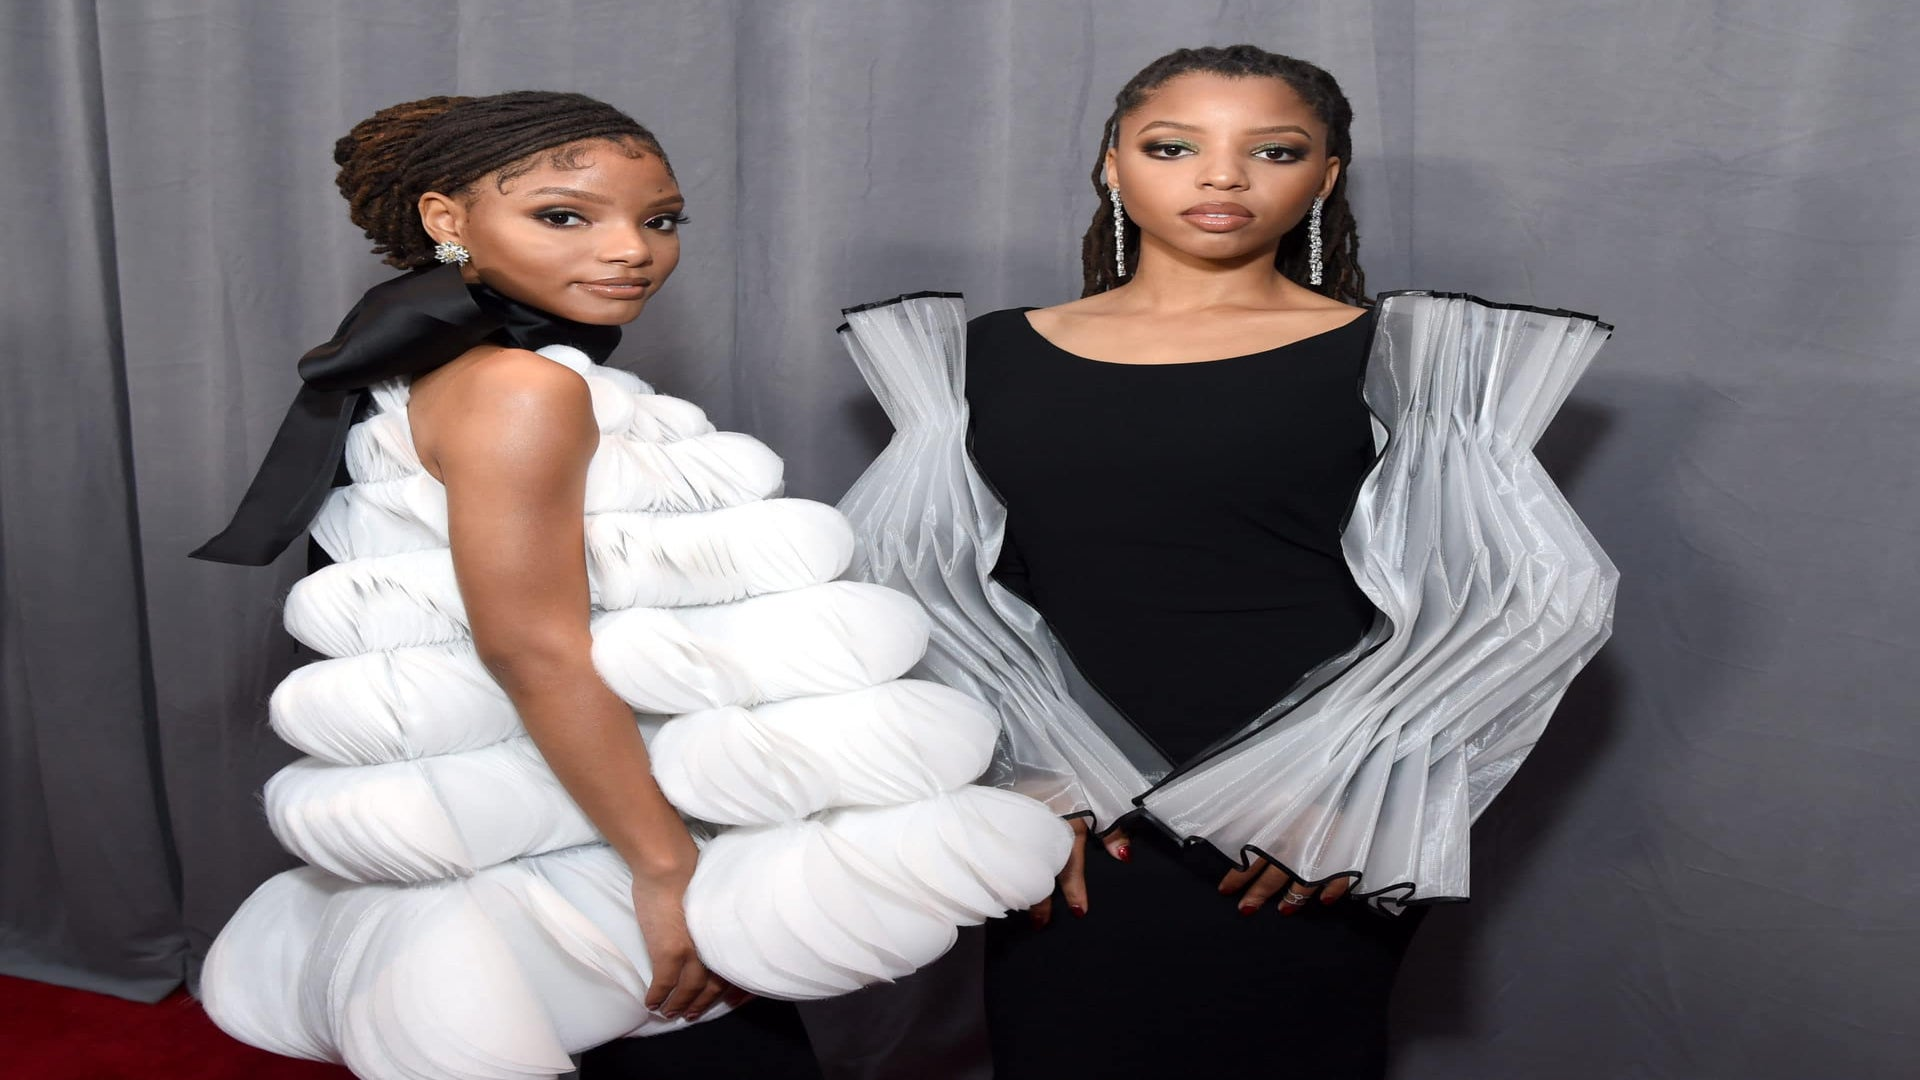 Grammys 2019: Music's Biggest Stars Share What's On Their Power Playlist